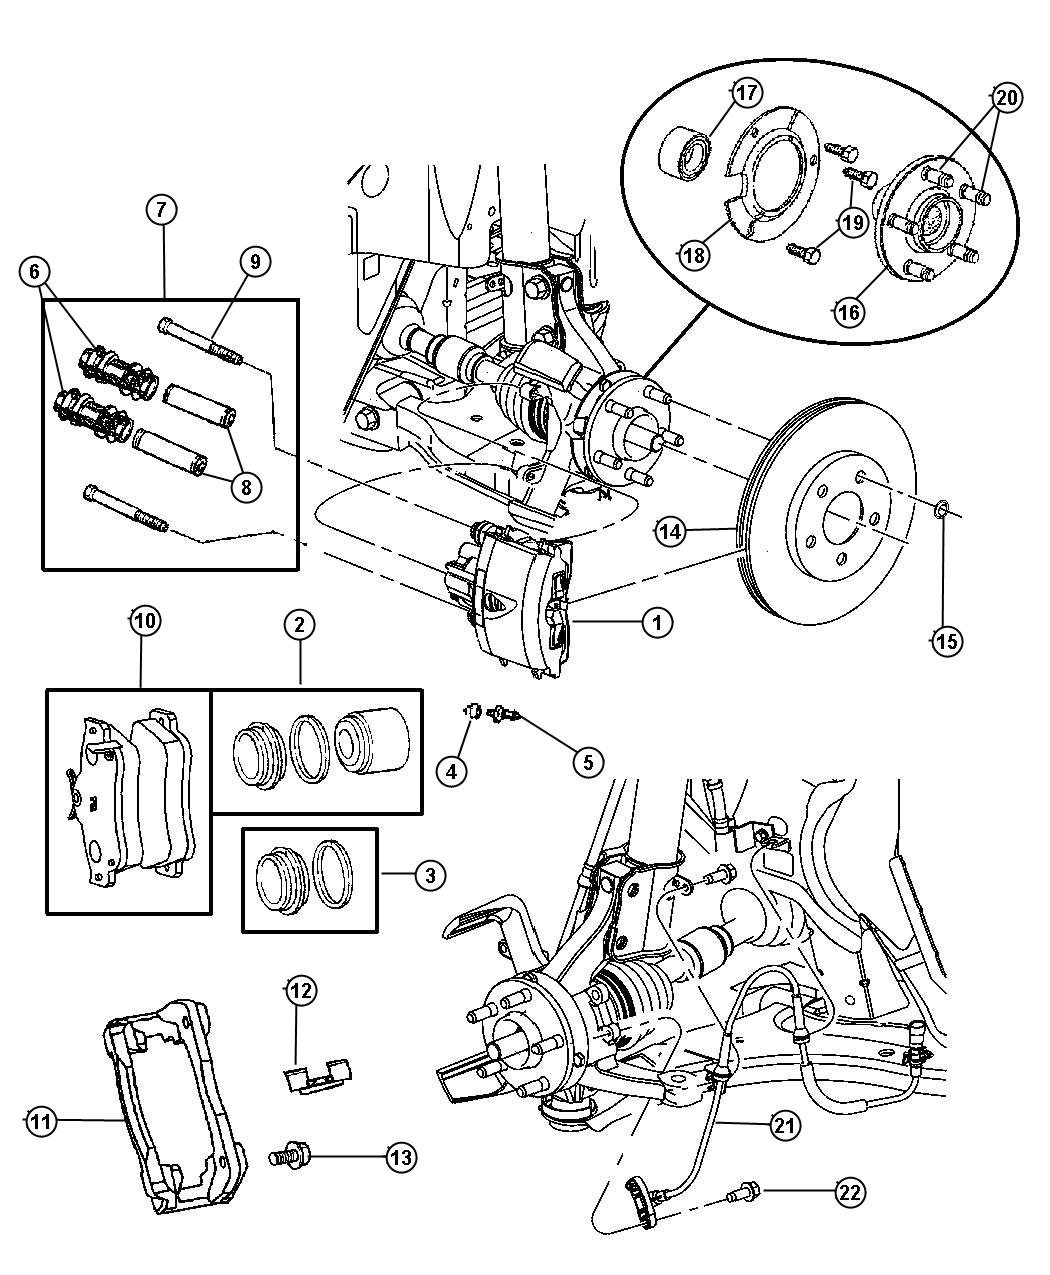 Dodge Neon Rear Drum Brake Diagram Com